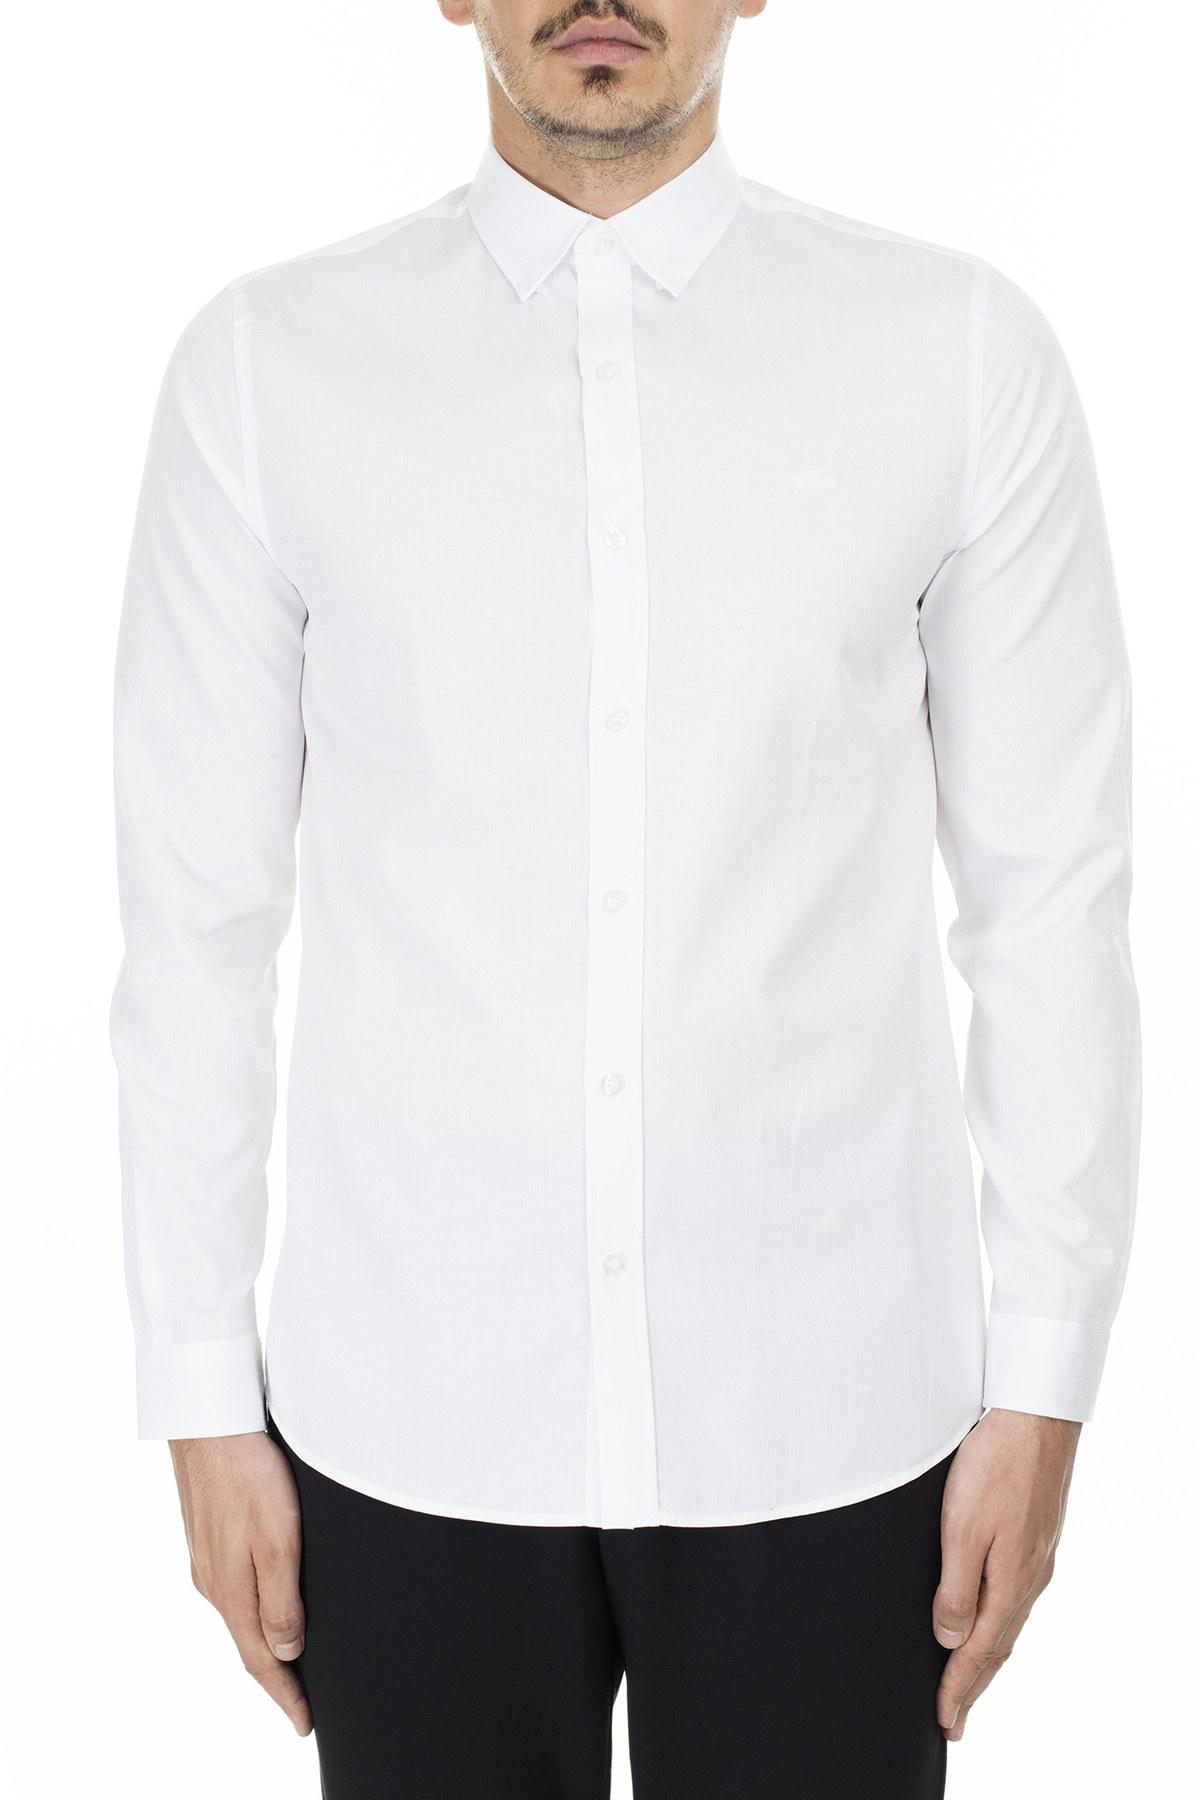 Lacoste Uzun Kollu % 100 Pamuk Slim Fit Erkek Gömlek CH2139 39A BEYAZ